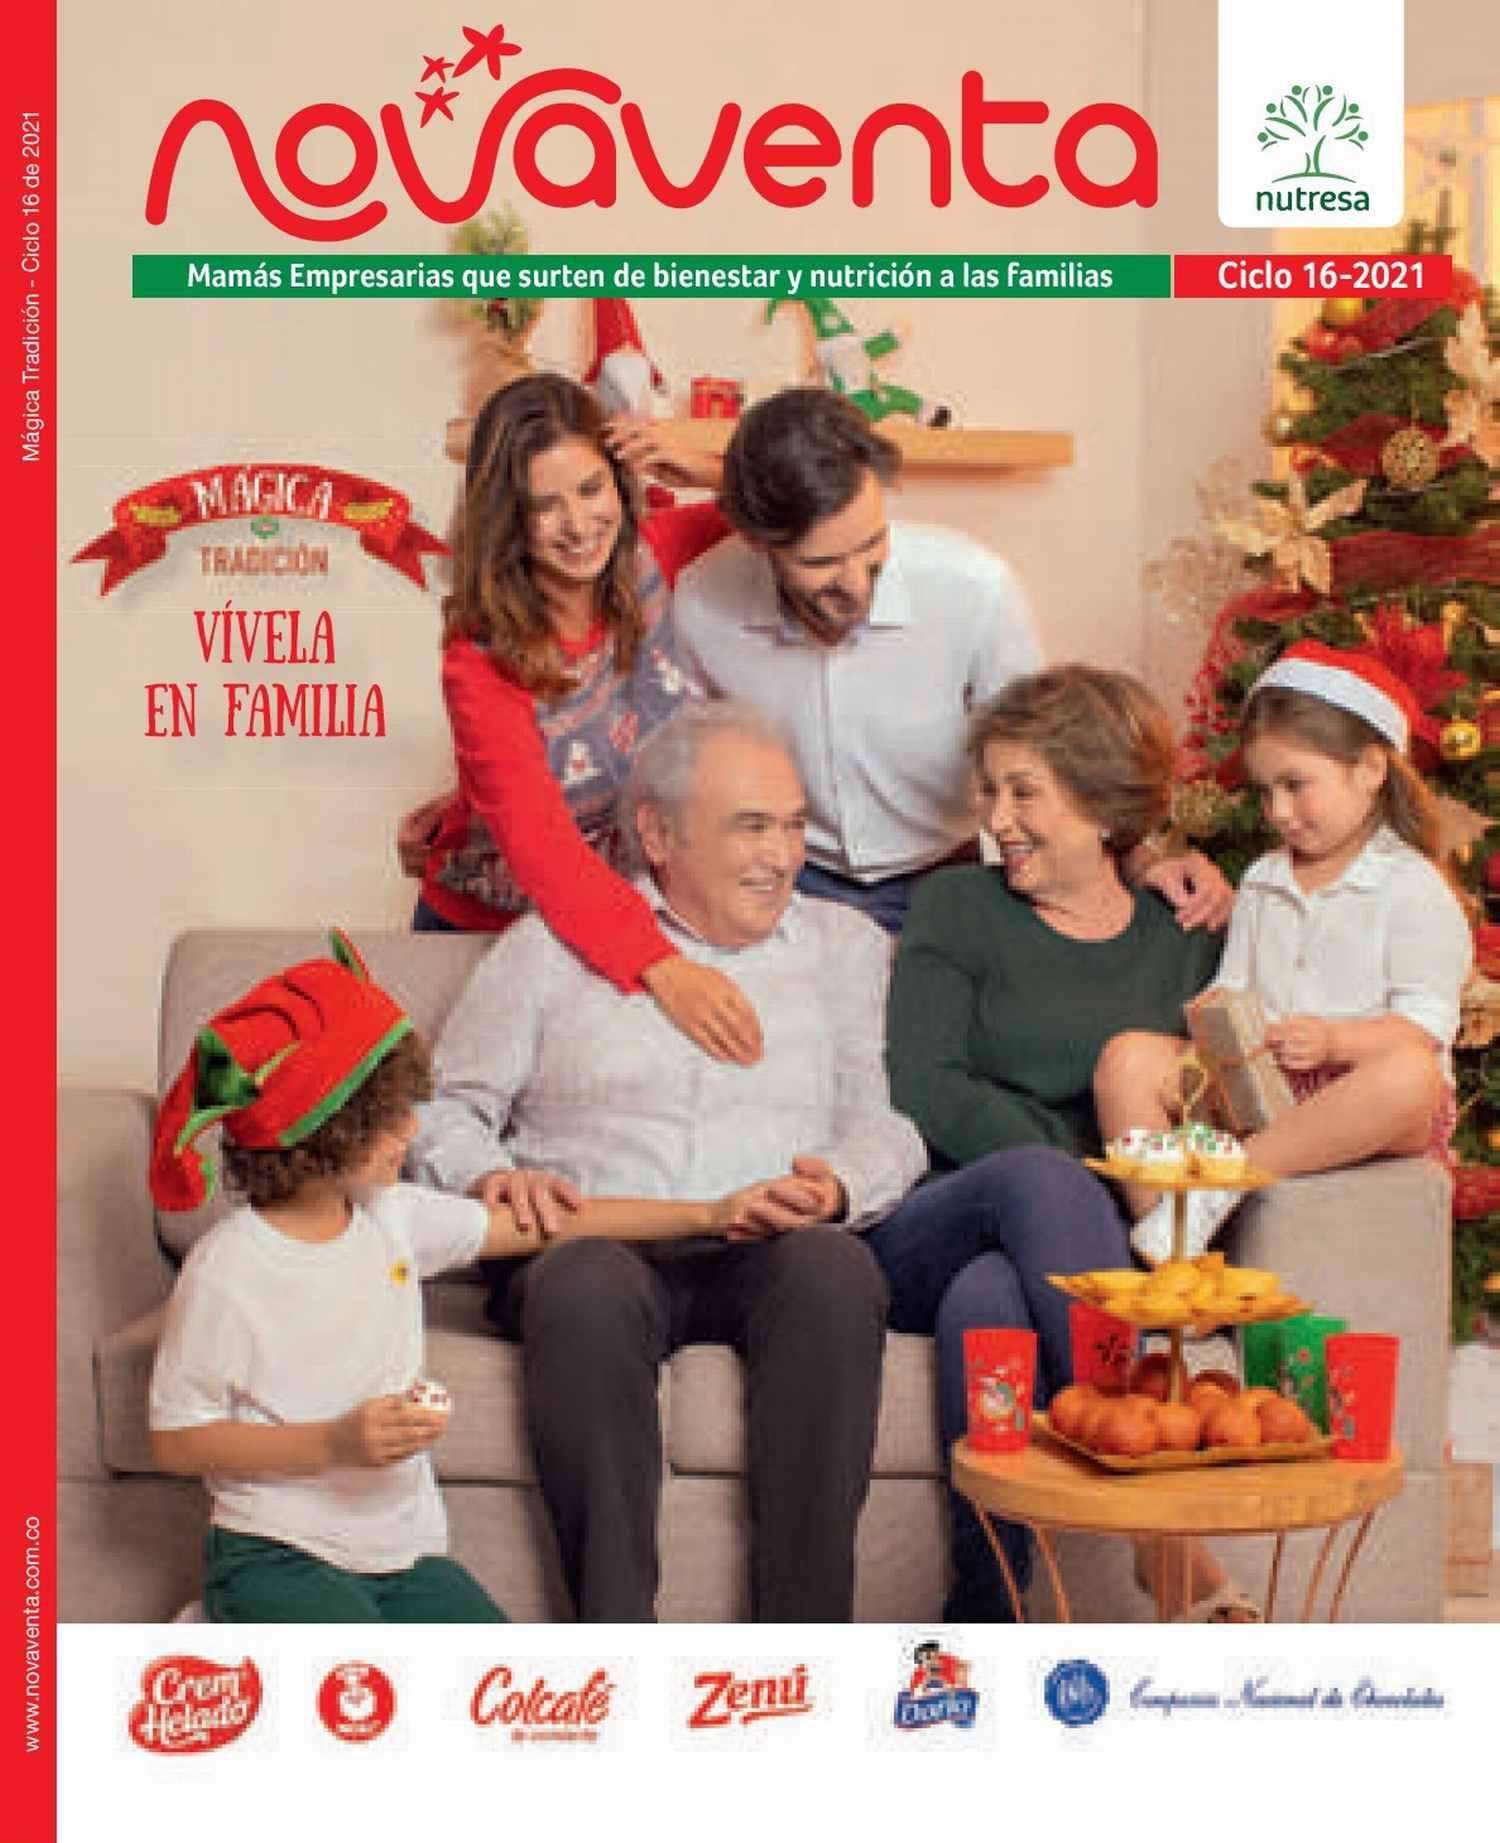 Catálogo Novaventa Ciclo 16 2021 Colombia